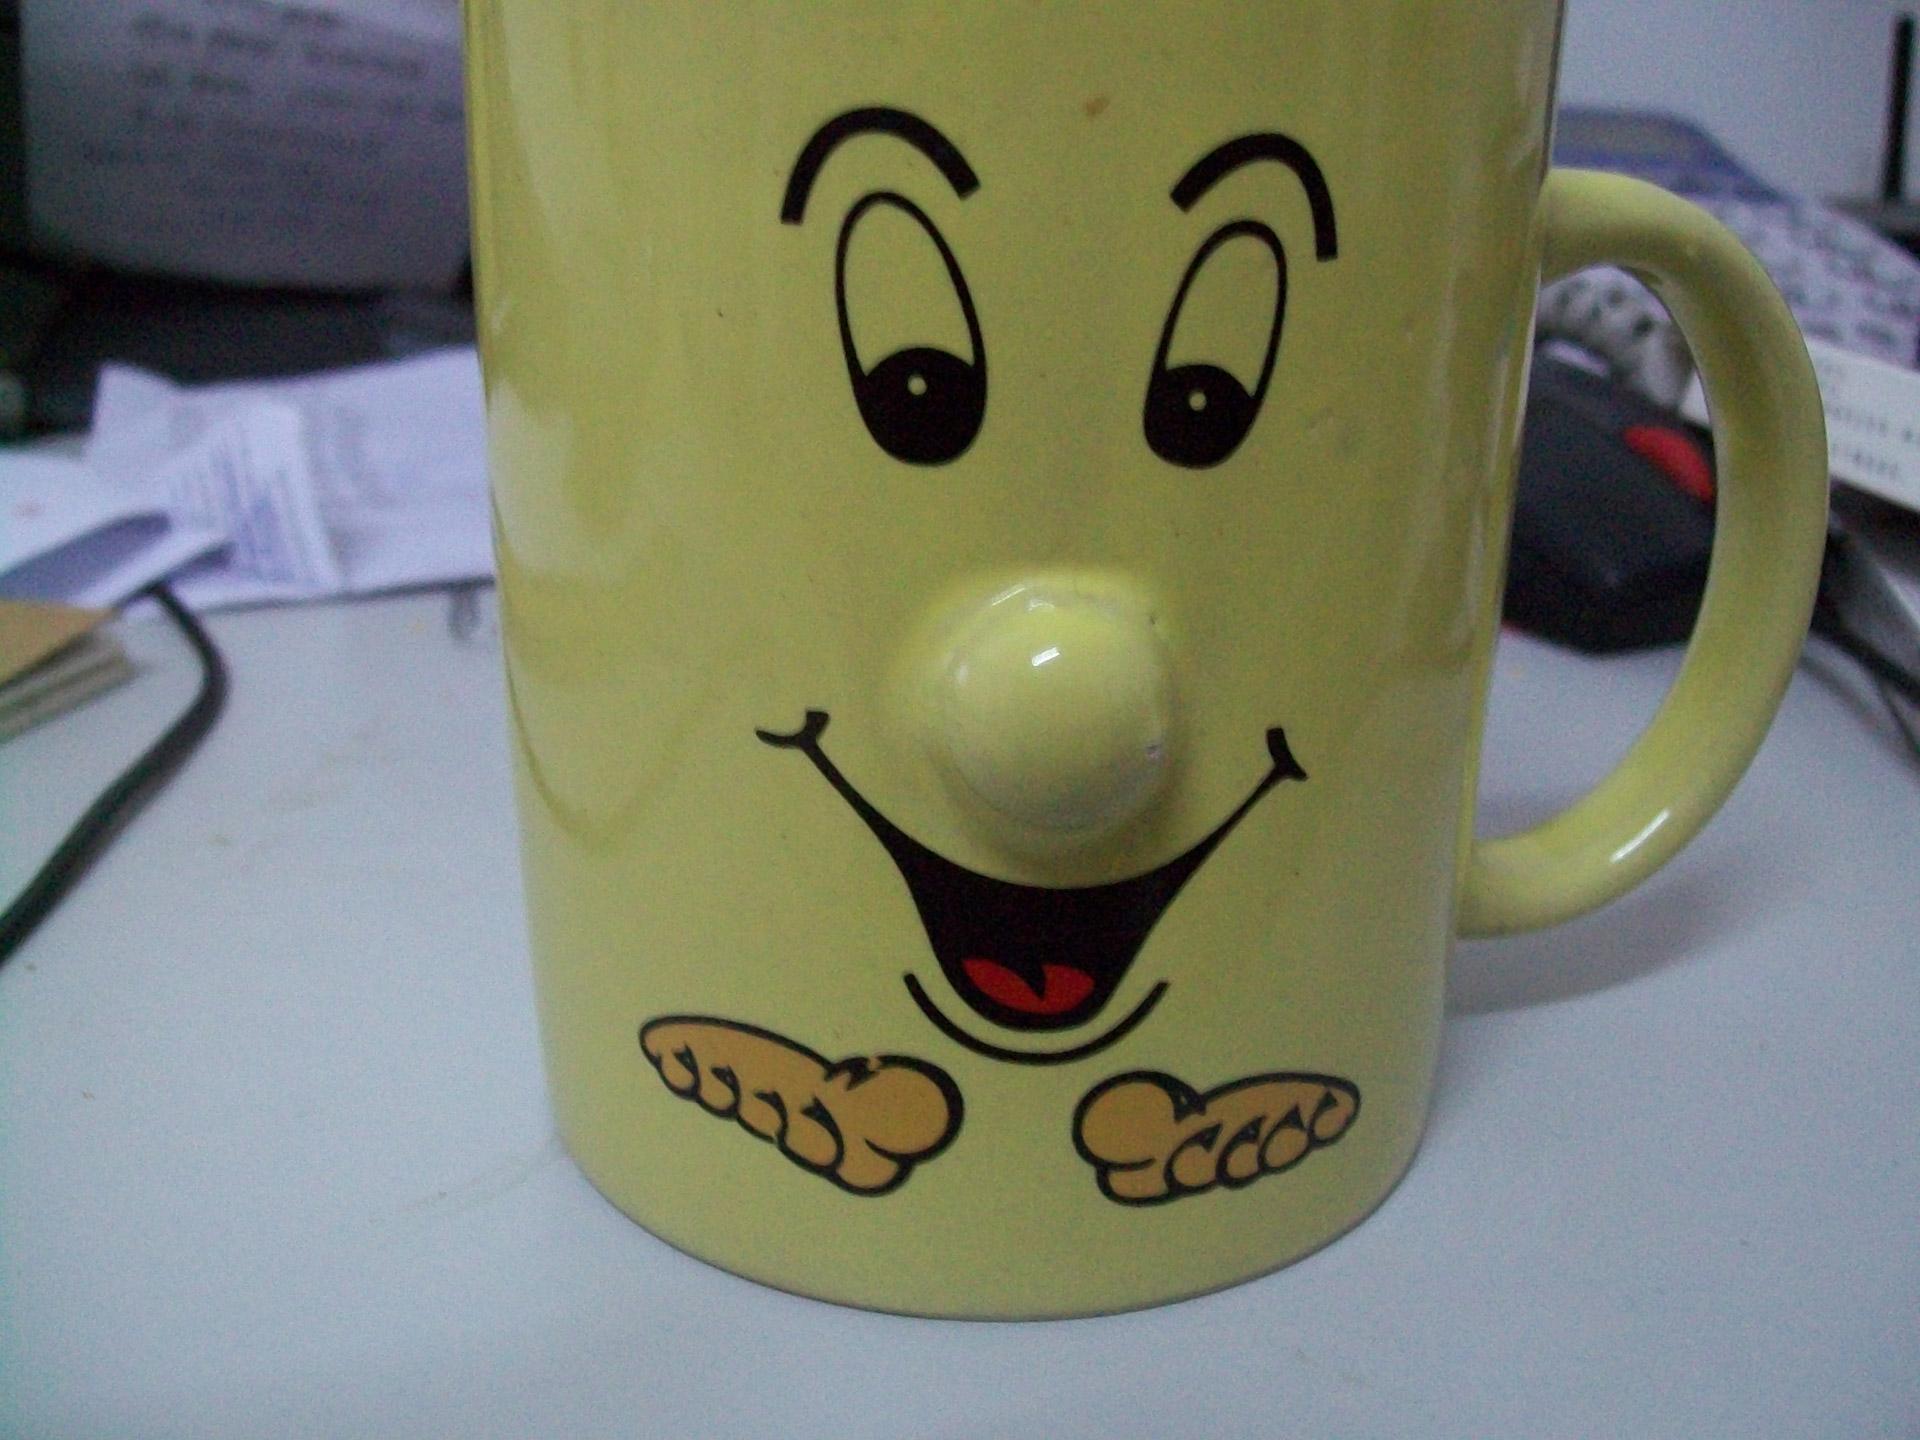 coffee dish Free Photo From Cup mug vessel iuPkXZ